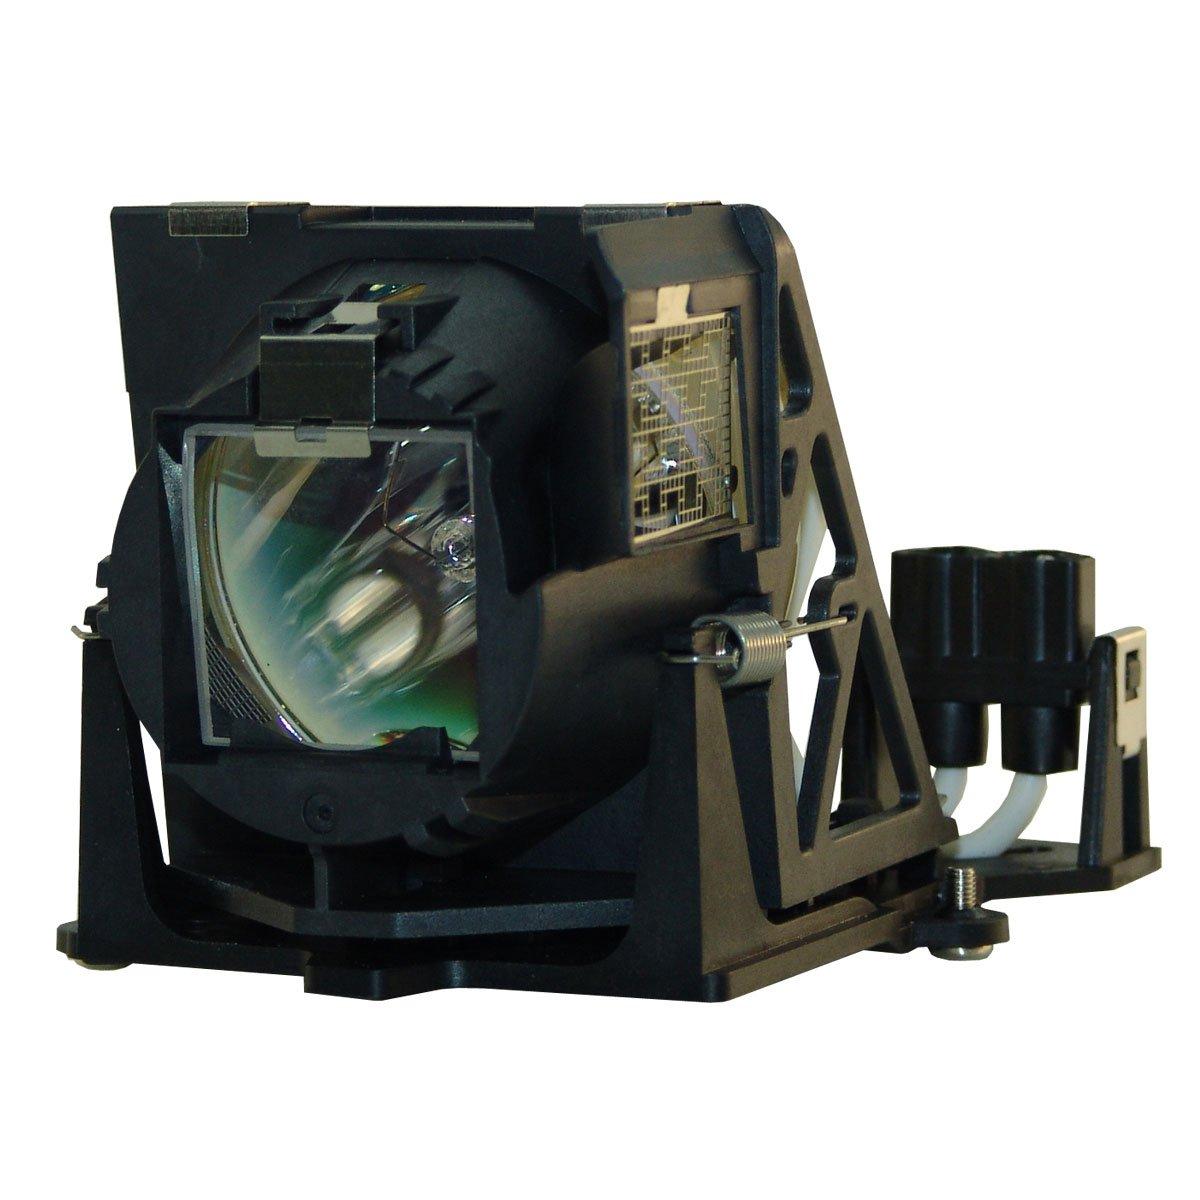 Lutema OEM プロジェクター交換用ランプ ハウジング/電球付き ProjectionDesign Action用 M5 MKII Platinum (Brighter/Durable) Platinum (Brighter/Durable) Lamp with Housing B07KTKRBN5